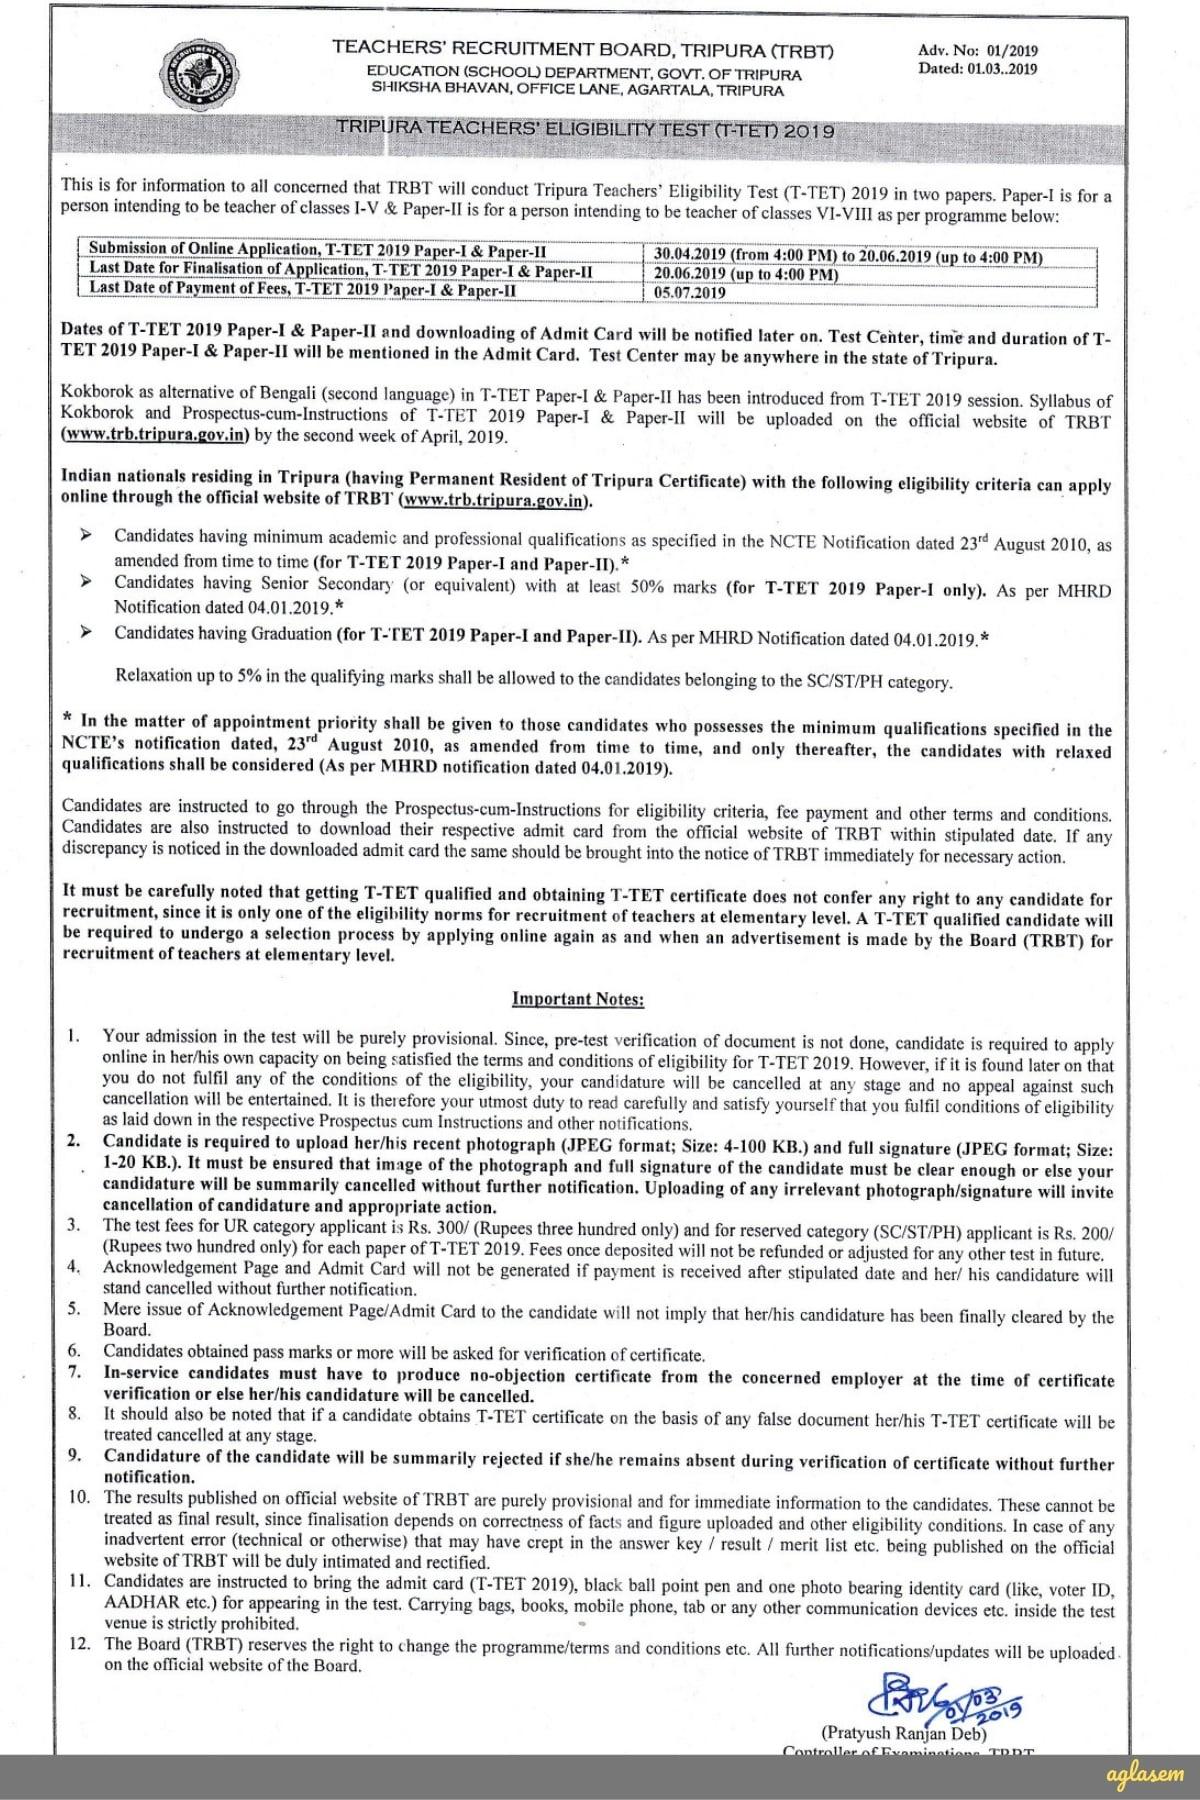 Tripura TET 2019 Notification